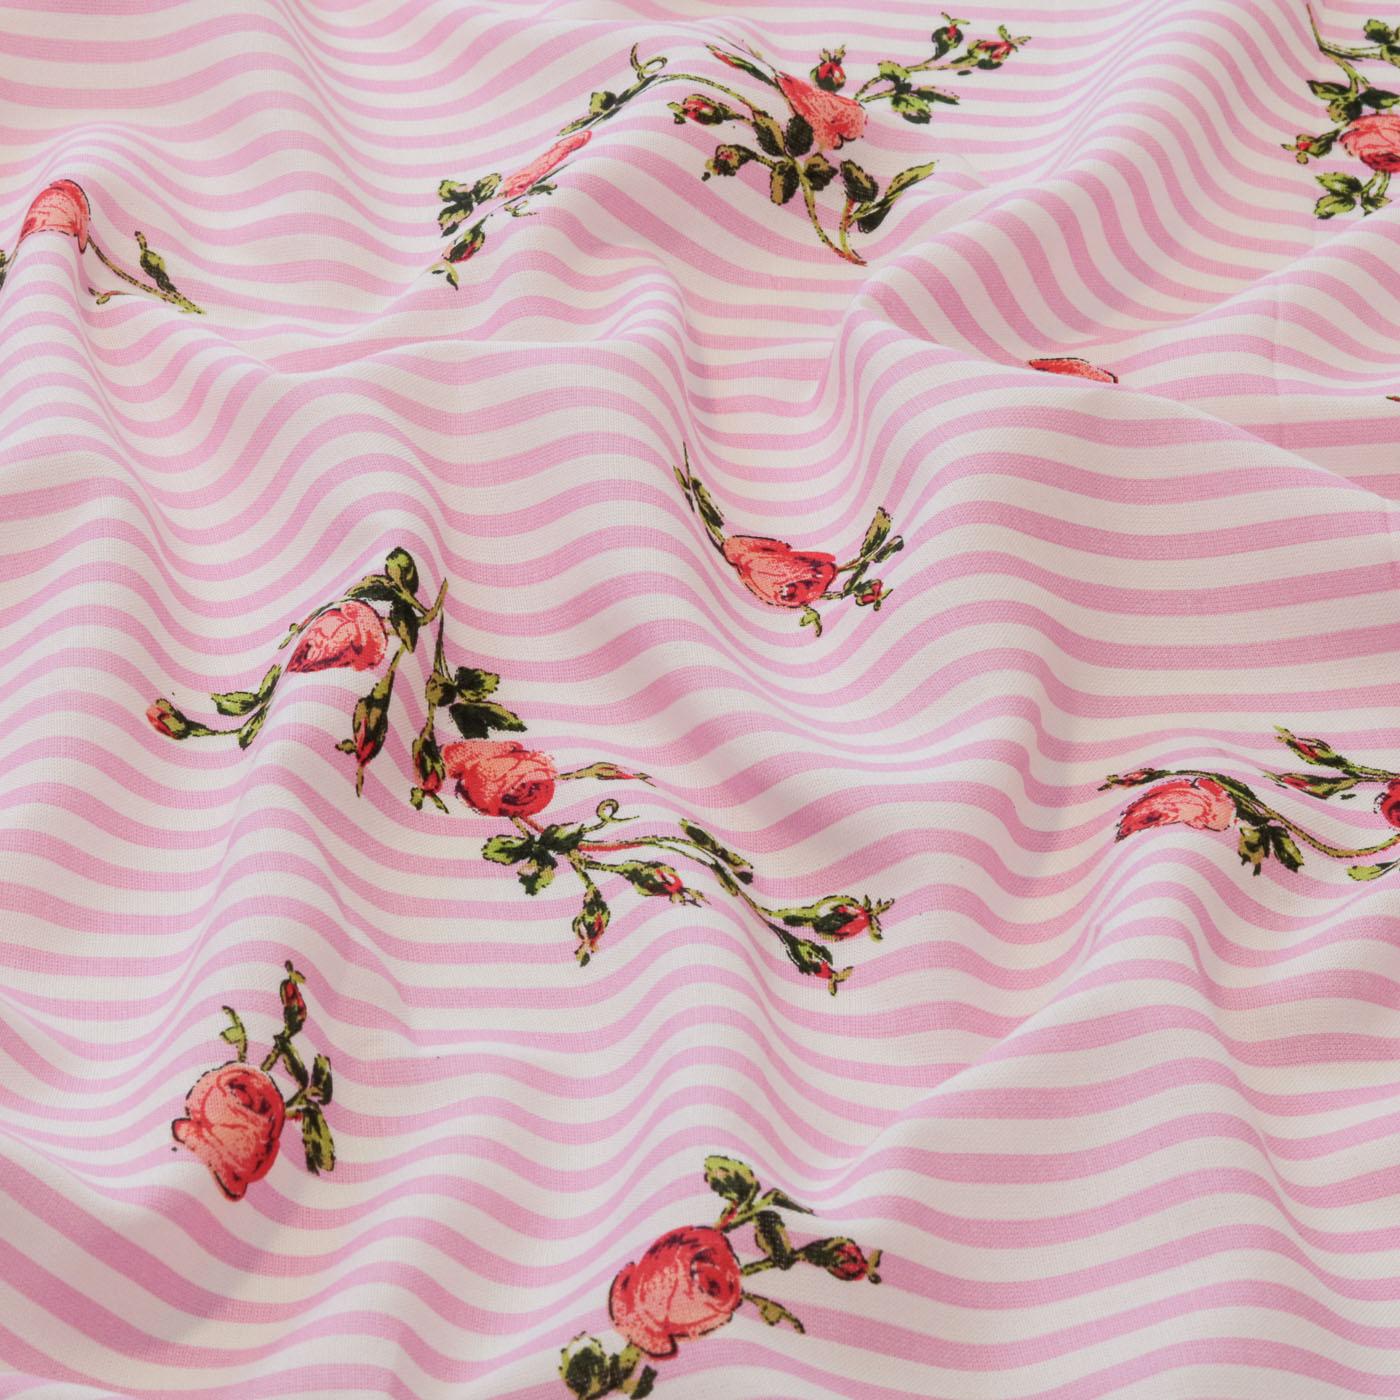 Tecido Viscose Estampado Listrado Flores 100% Viscose Rosa